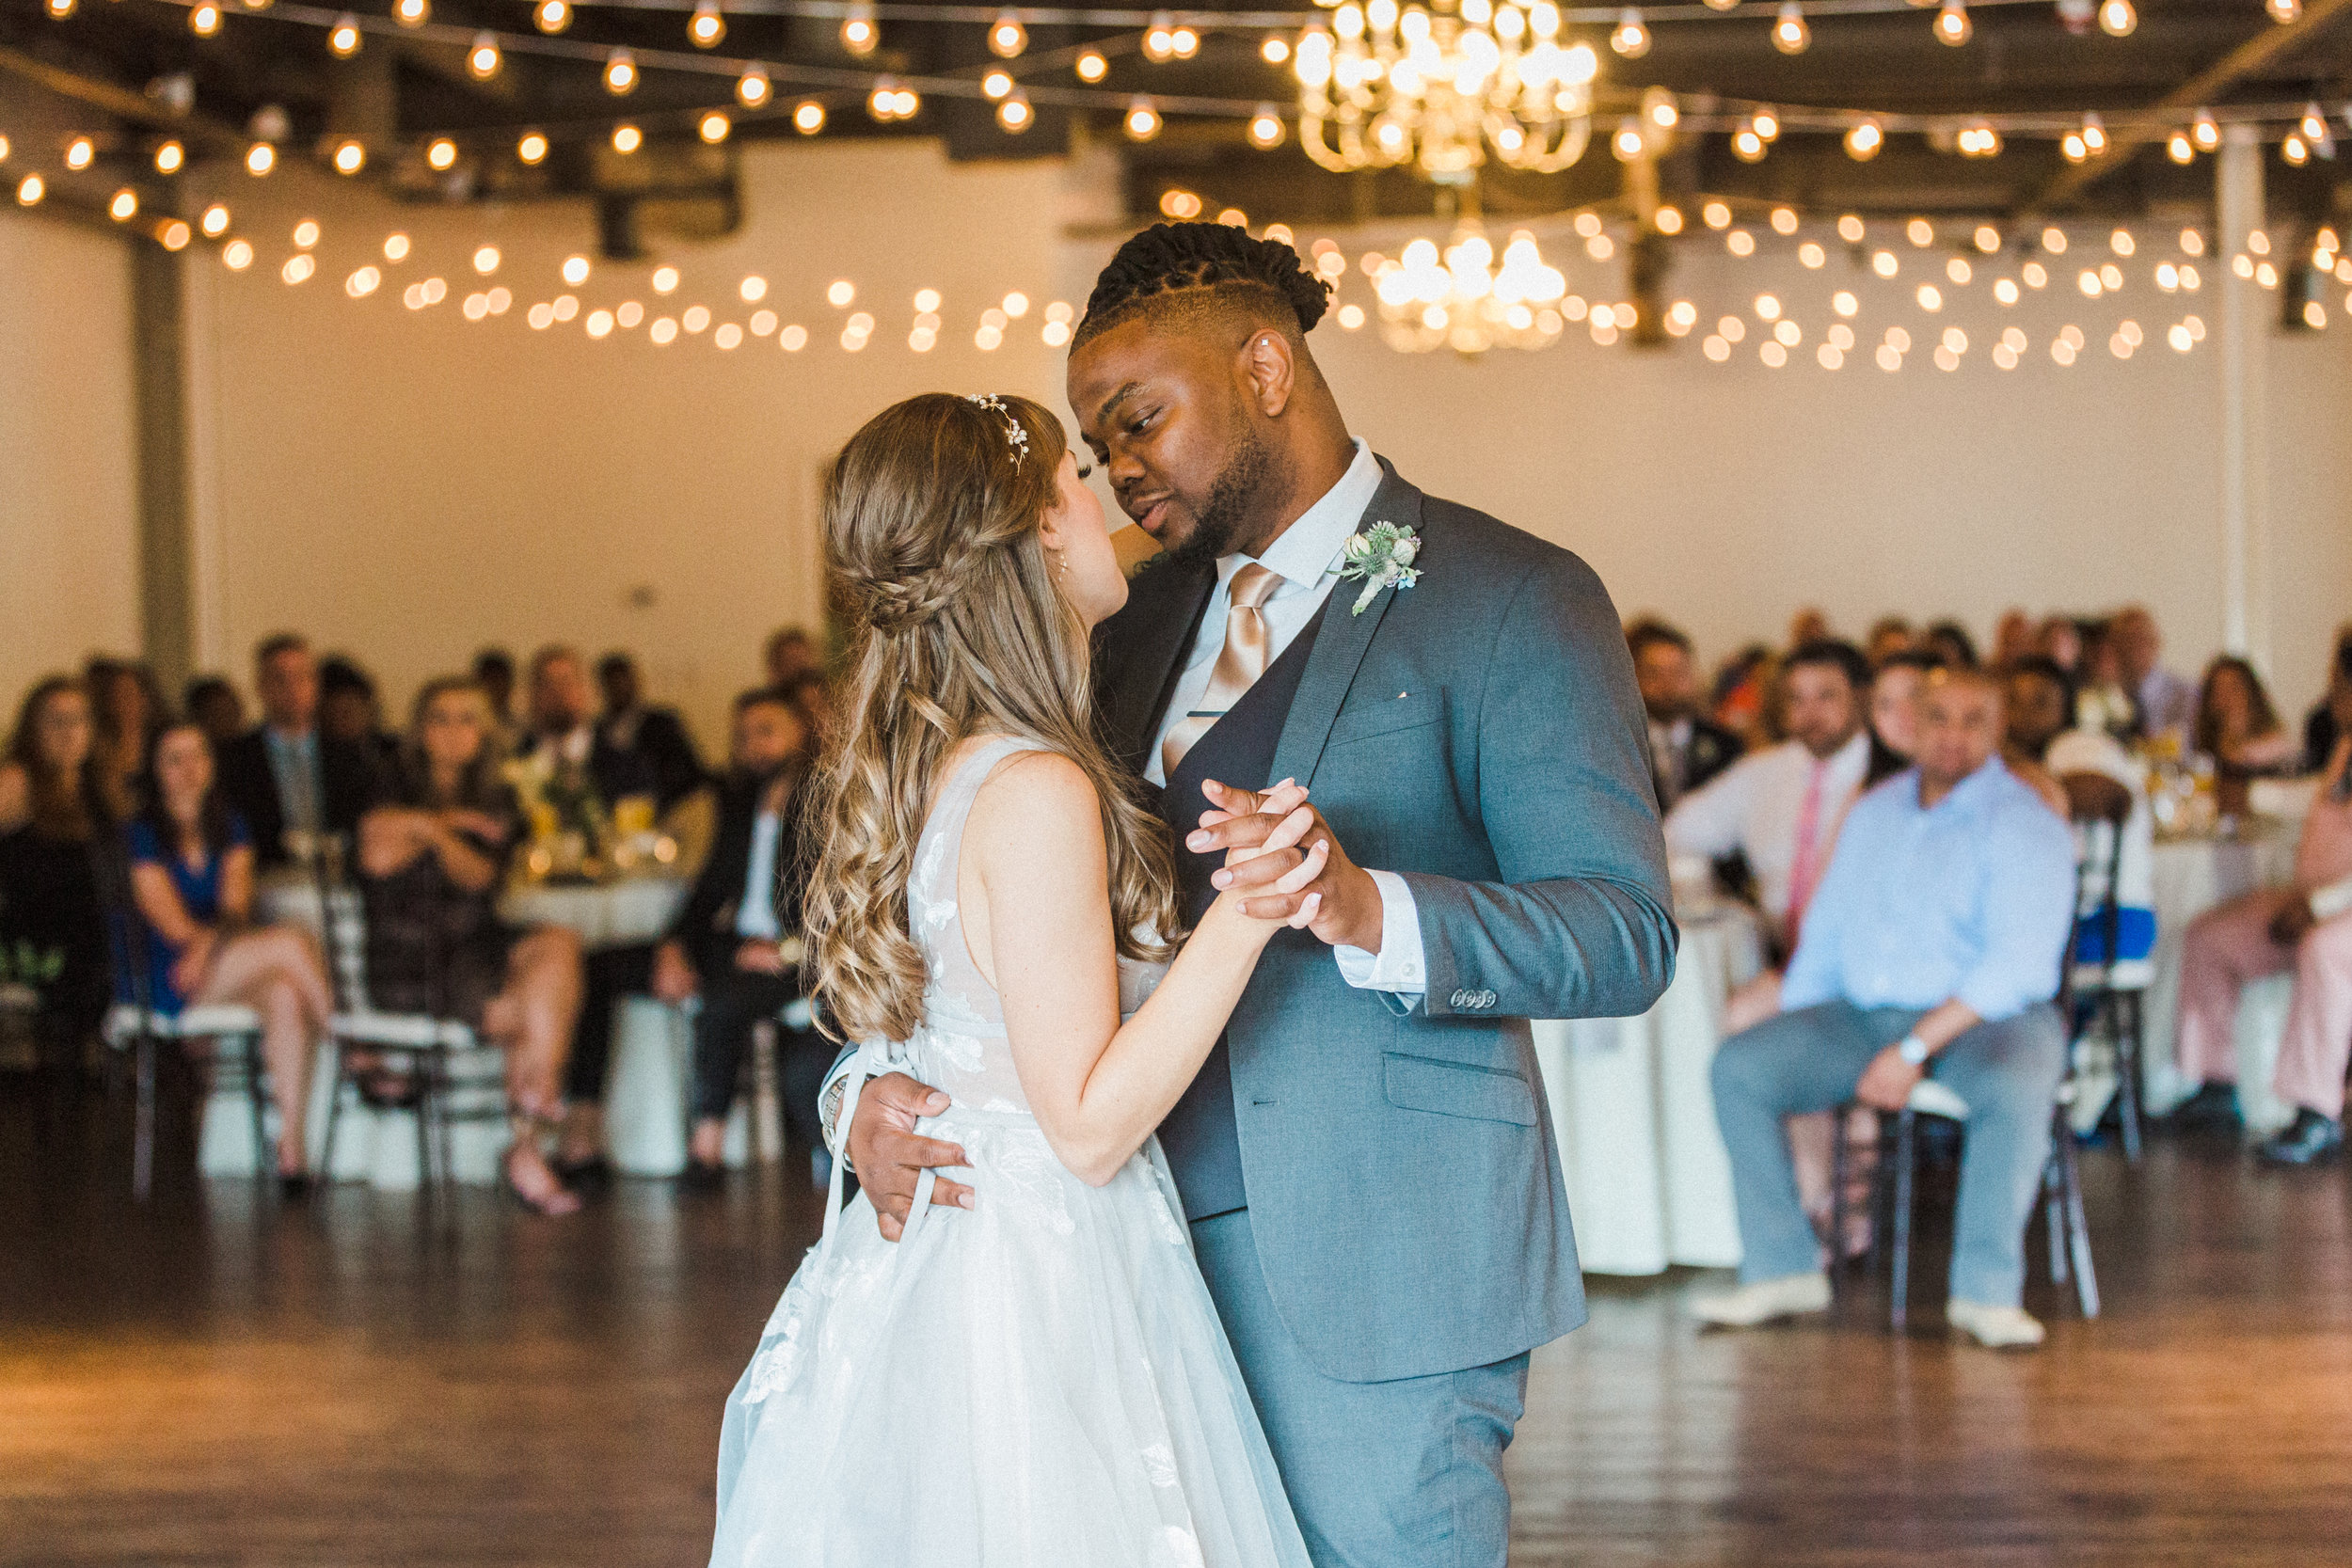 Mallory and Aaron - Married - Sneaks - Lauren Alisse Photography-62.jpg